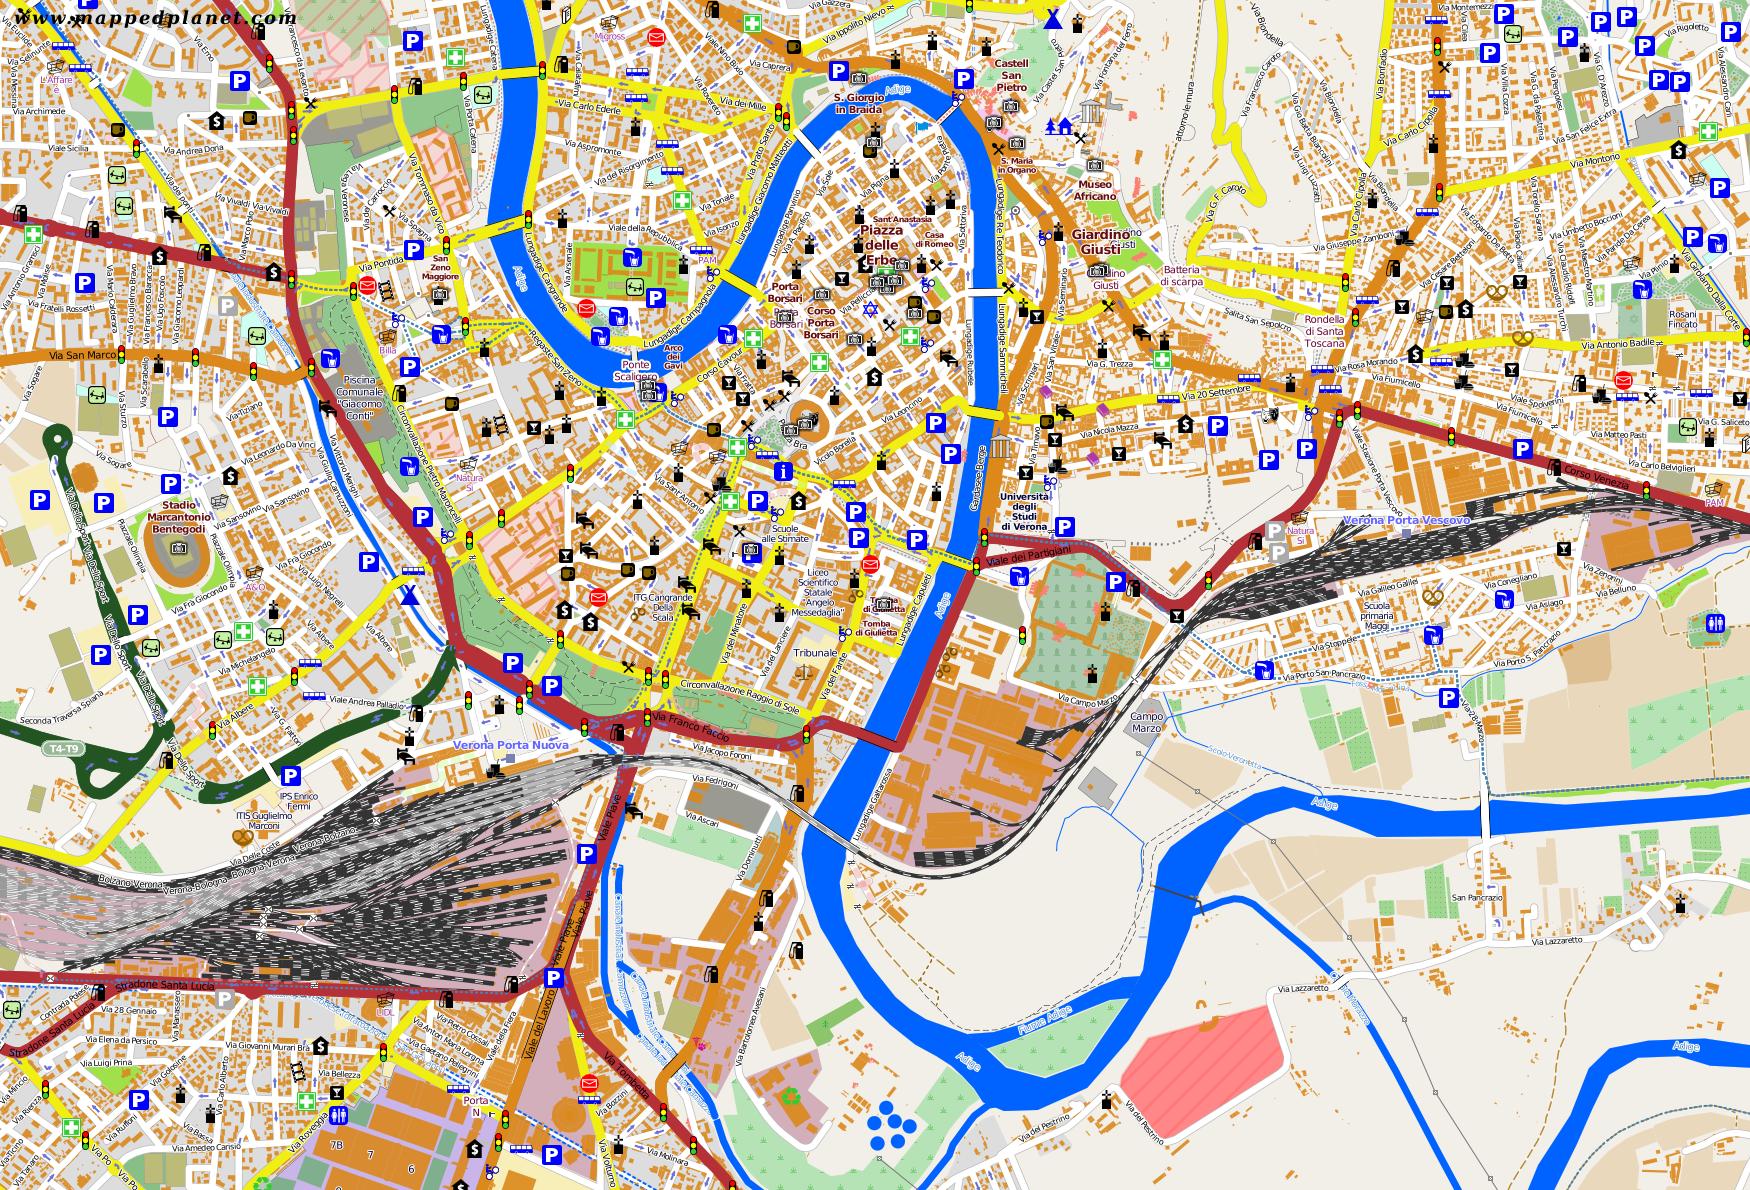 verona tourism map - photo#18